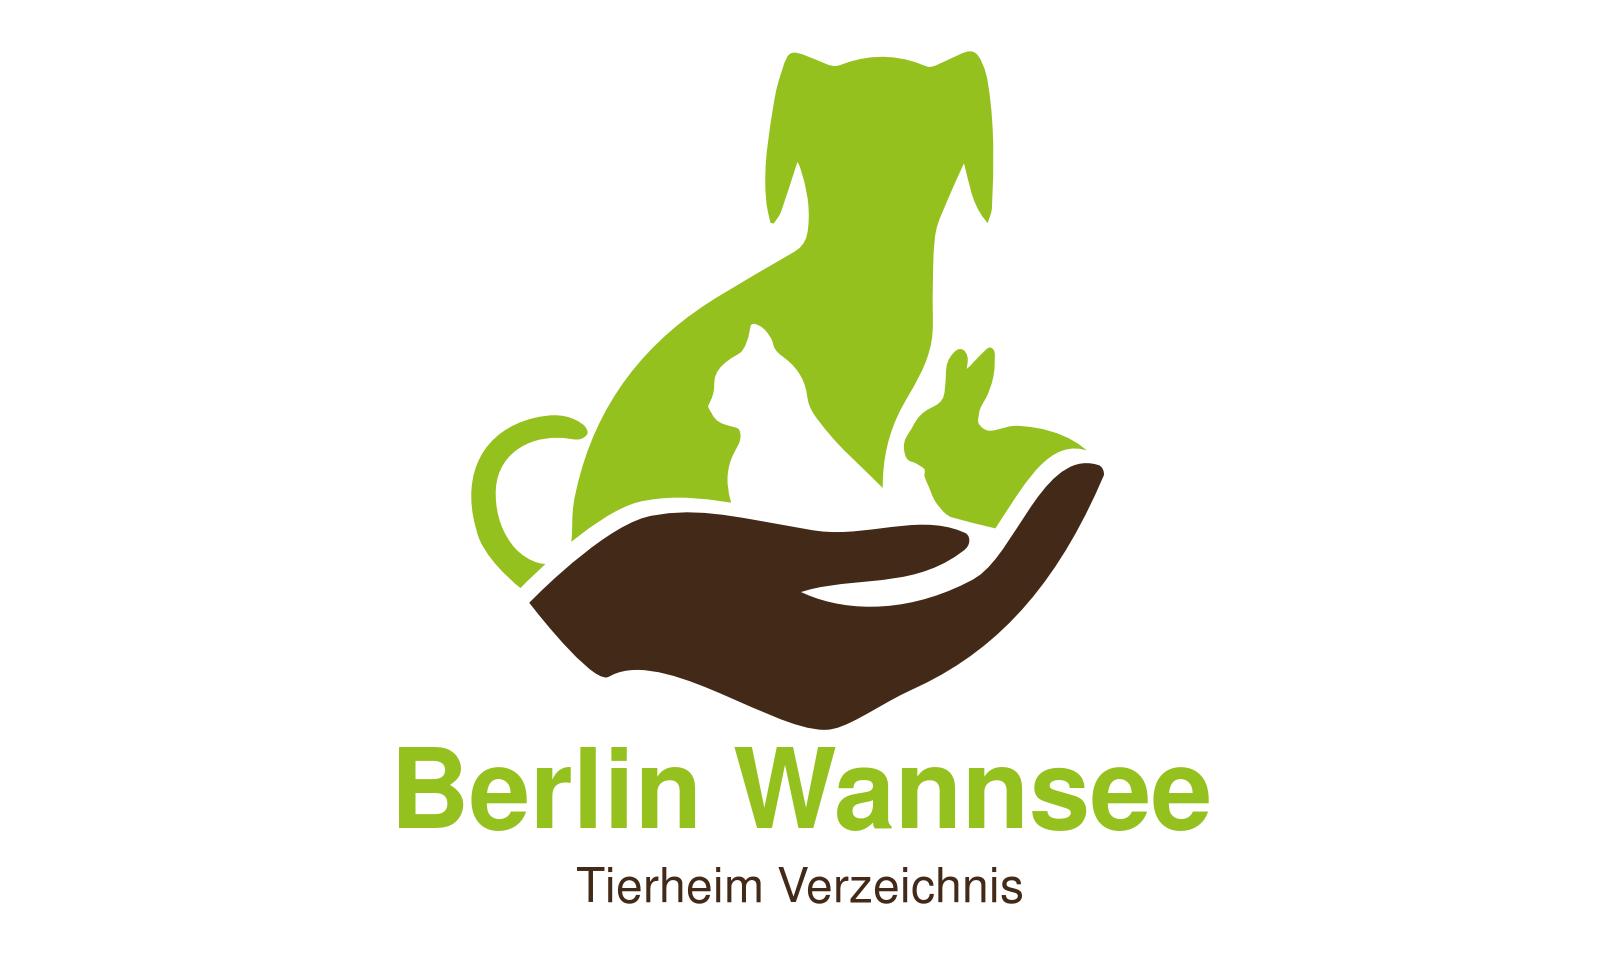 Tierheim Berlin Wannsee